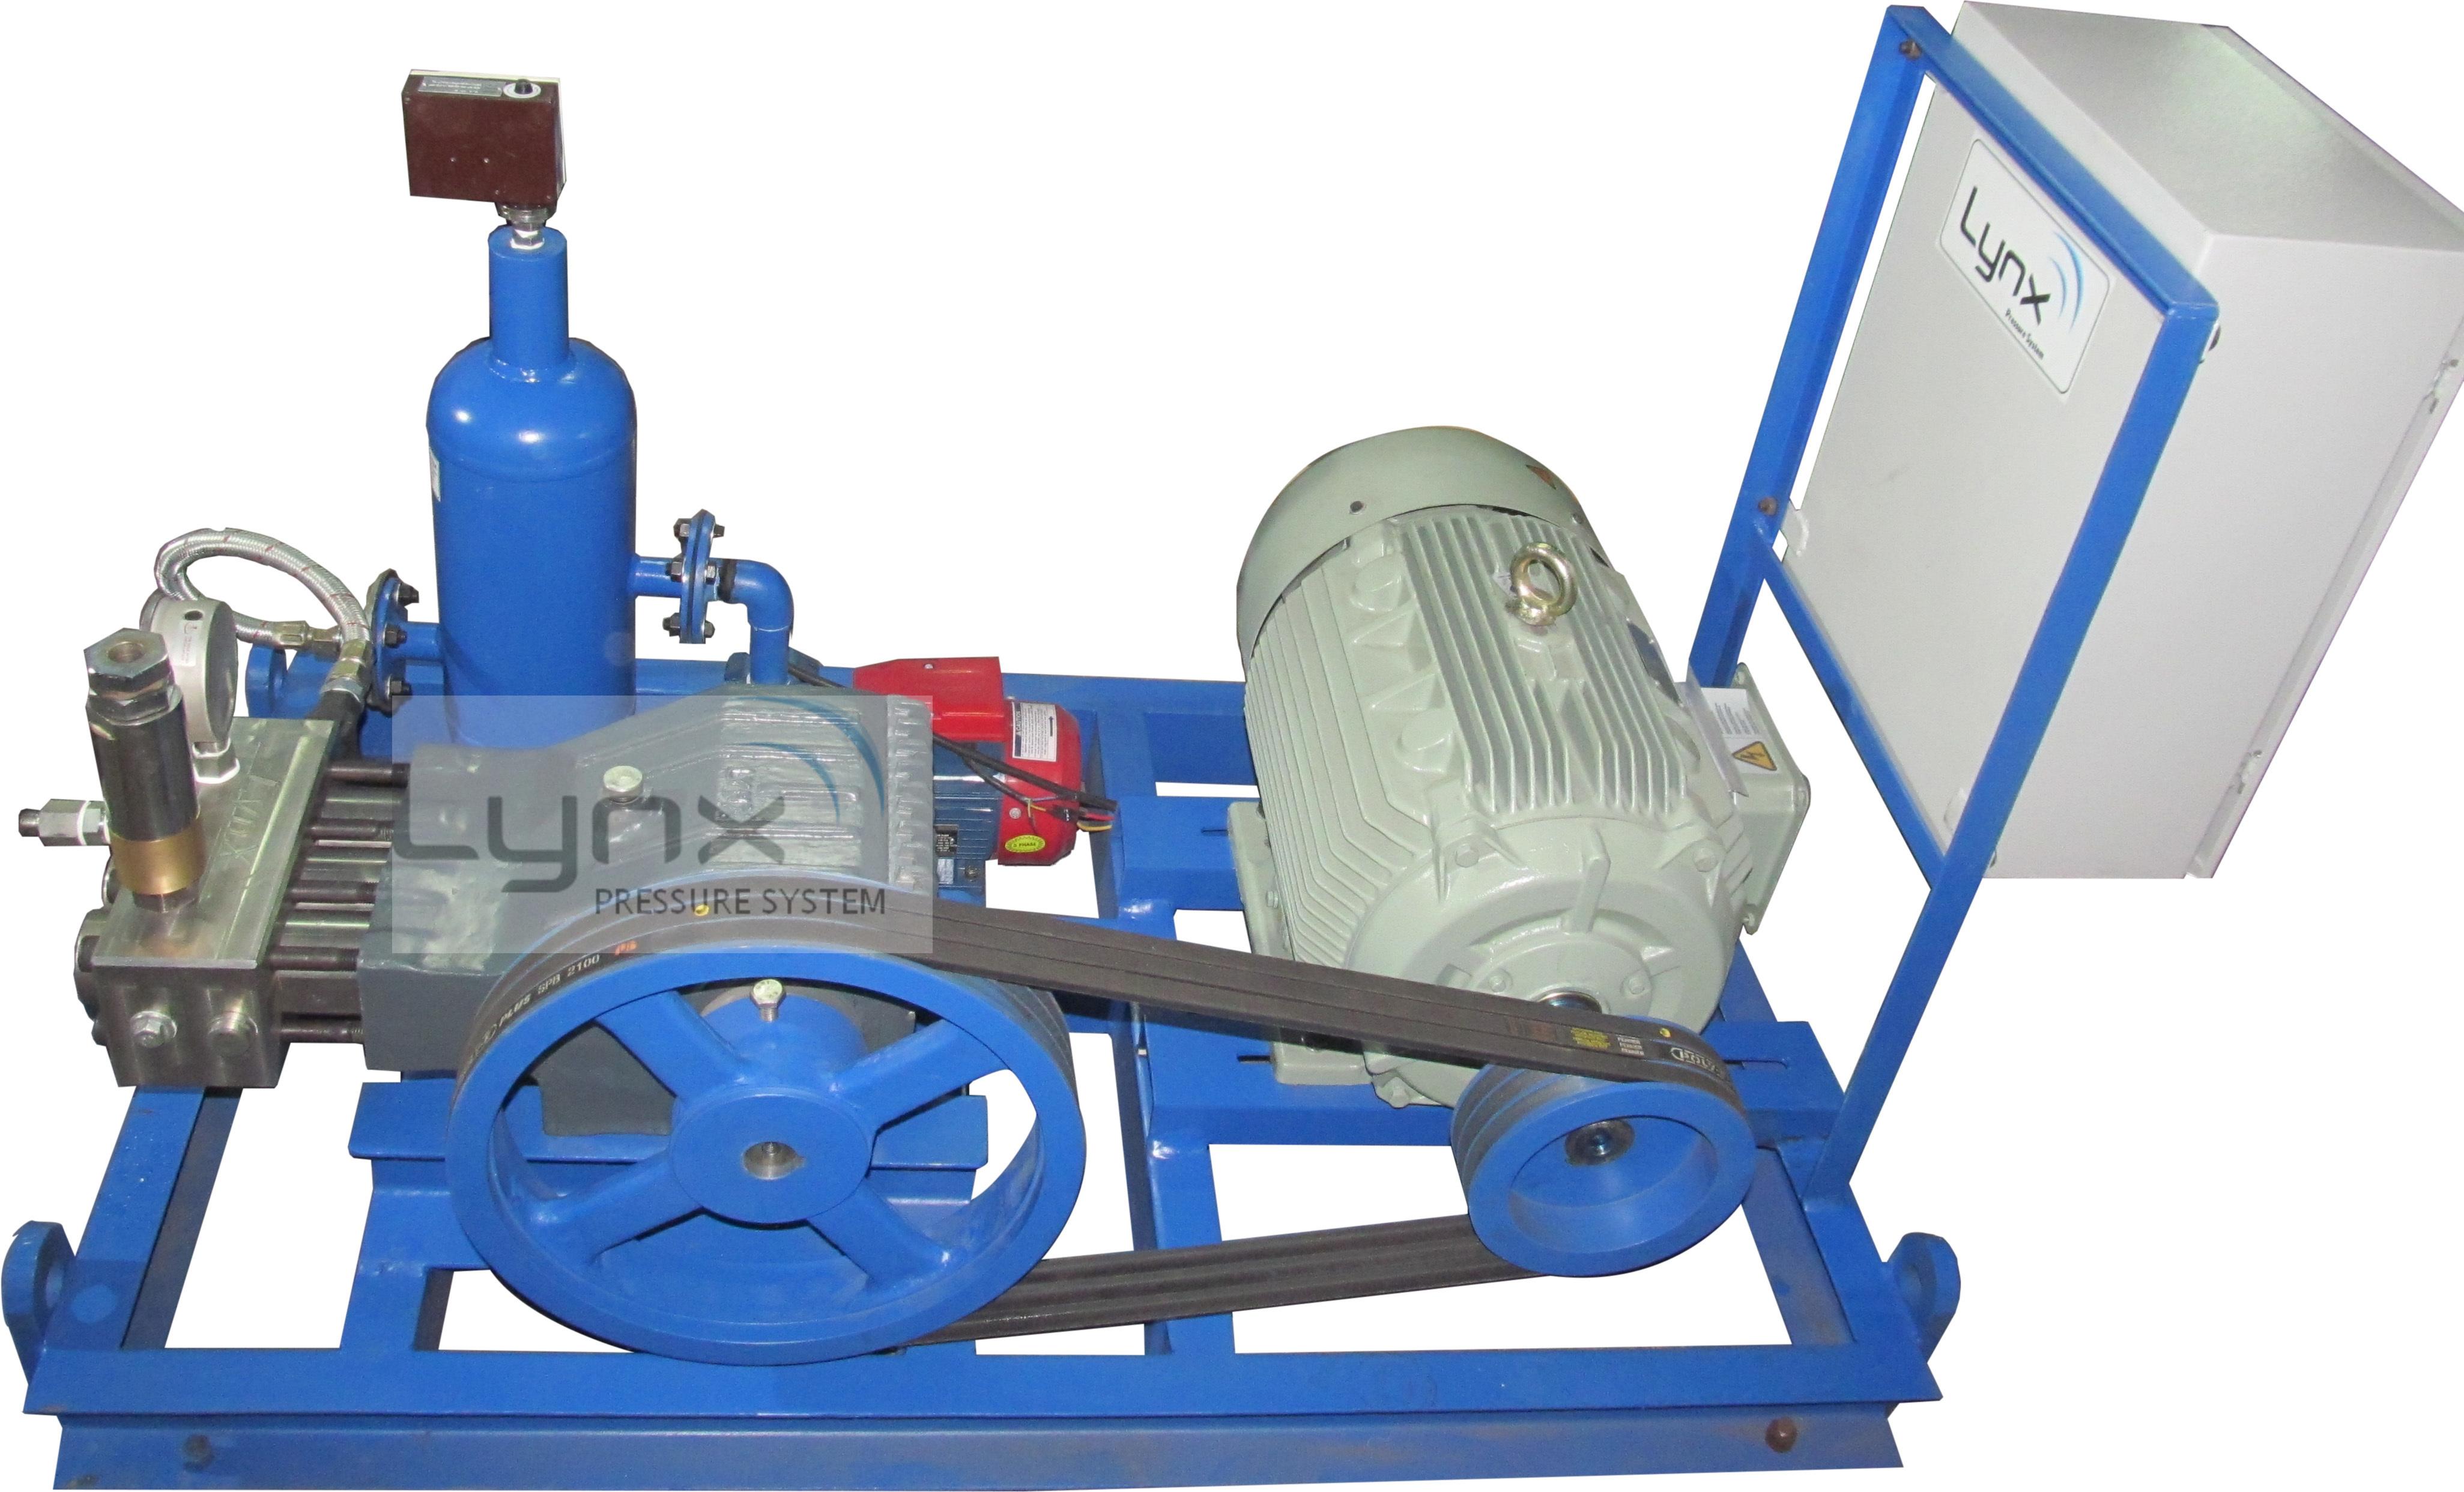 High Pressure Hydrostatic Test Pumps - 1200 BAR